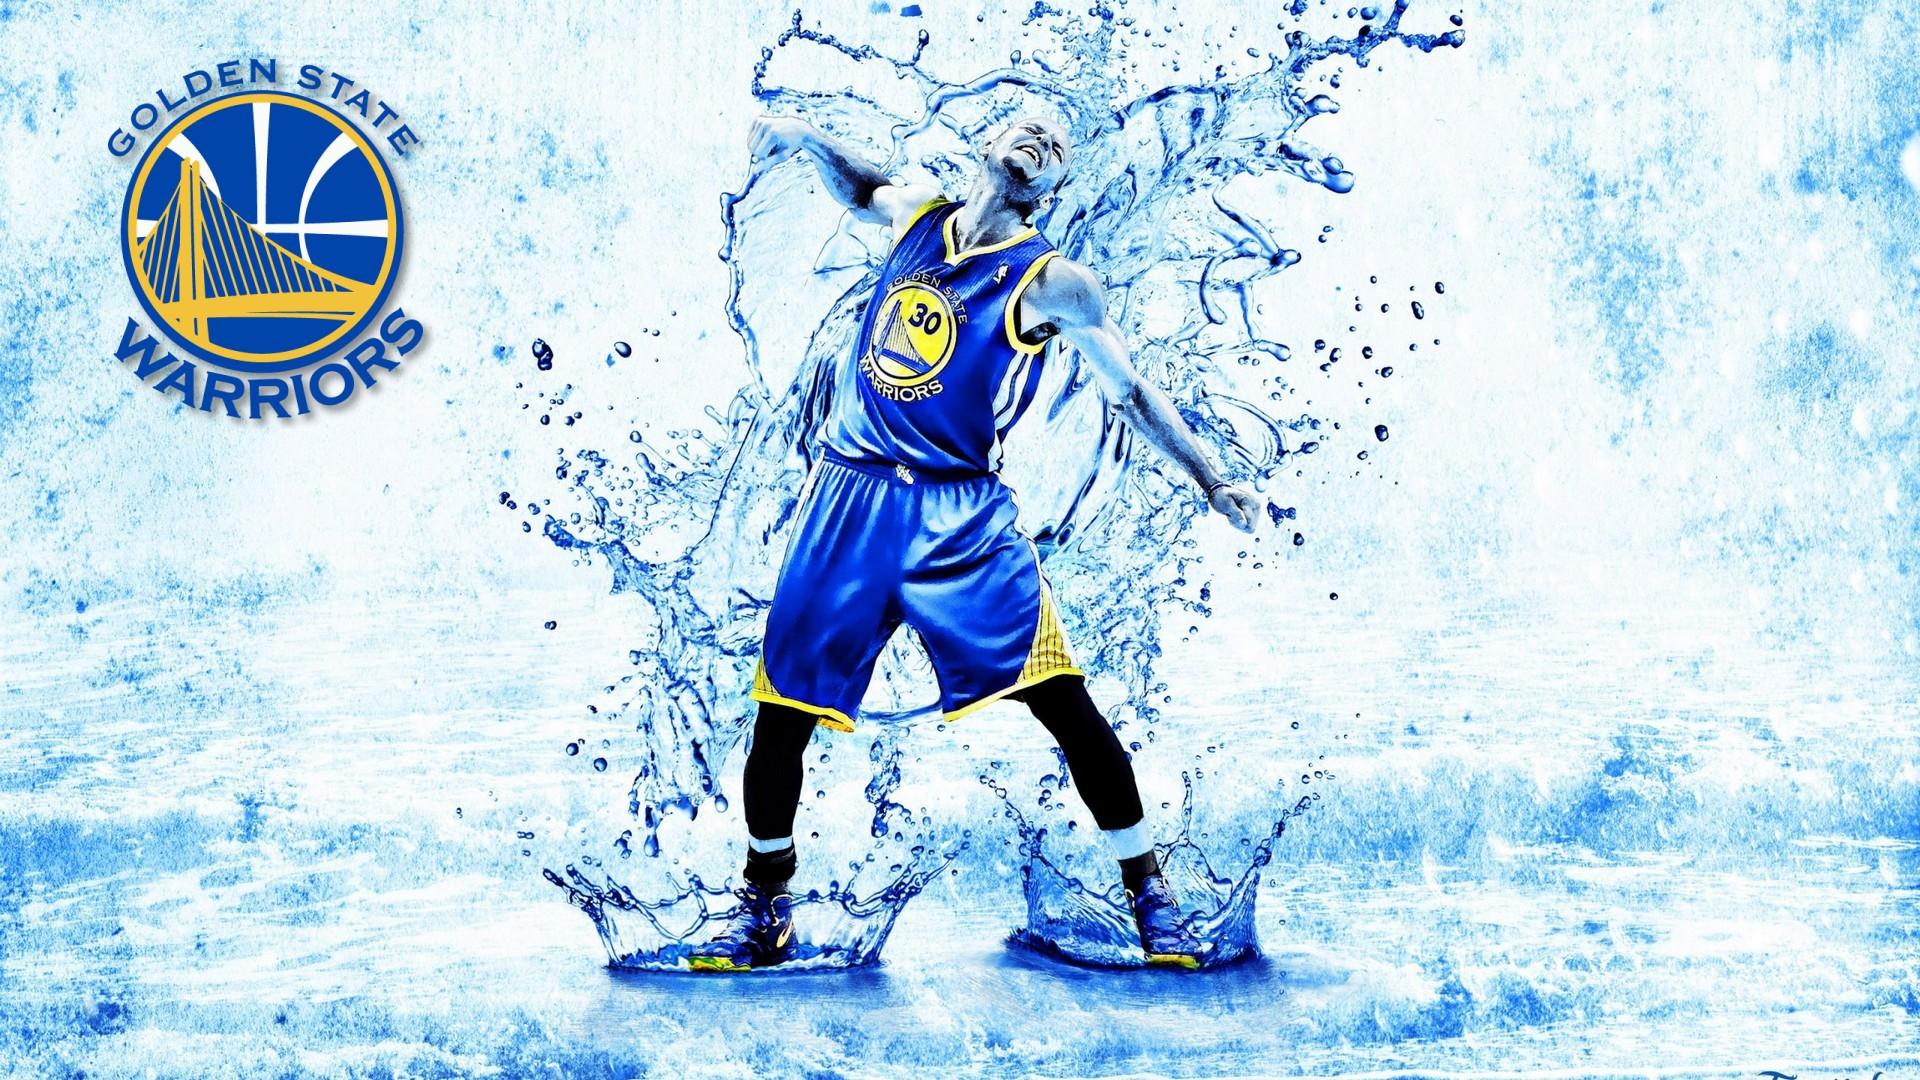 Stephen Curry HD Wallpapers 2020 Basketball Wallpaper 1920x1080